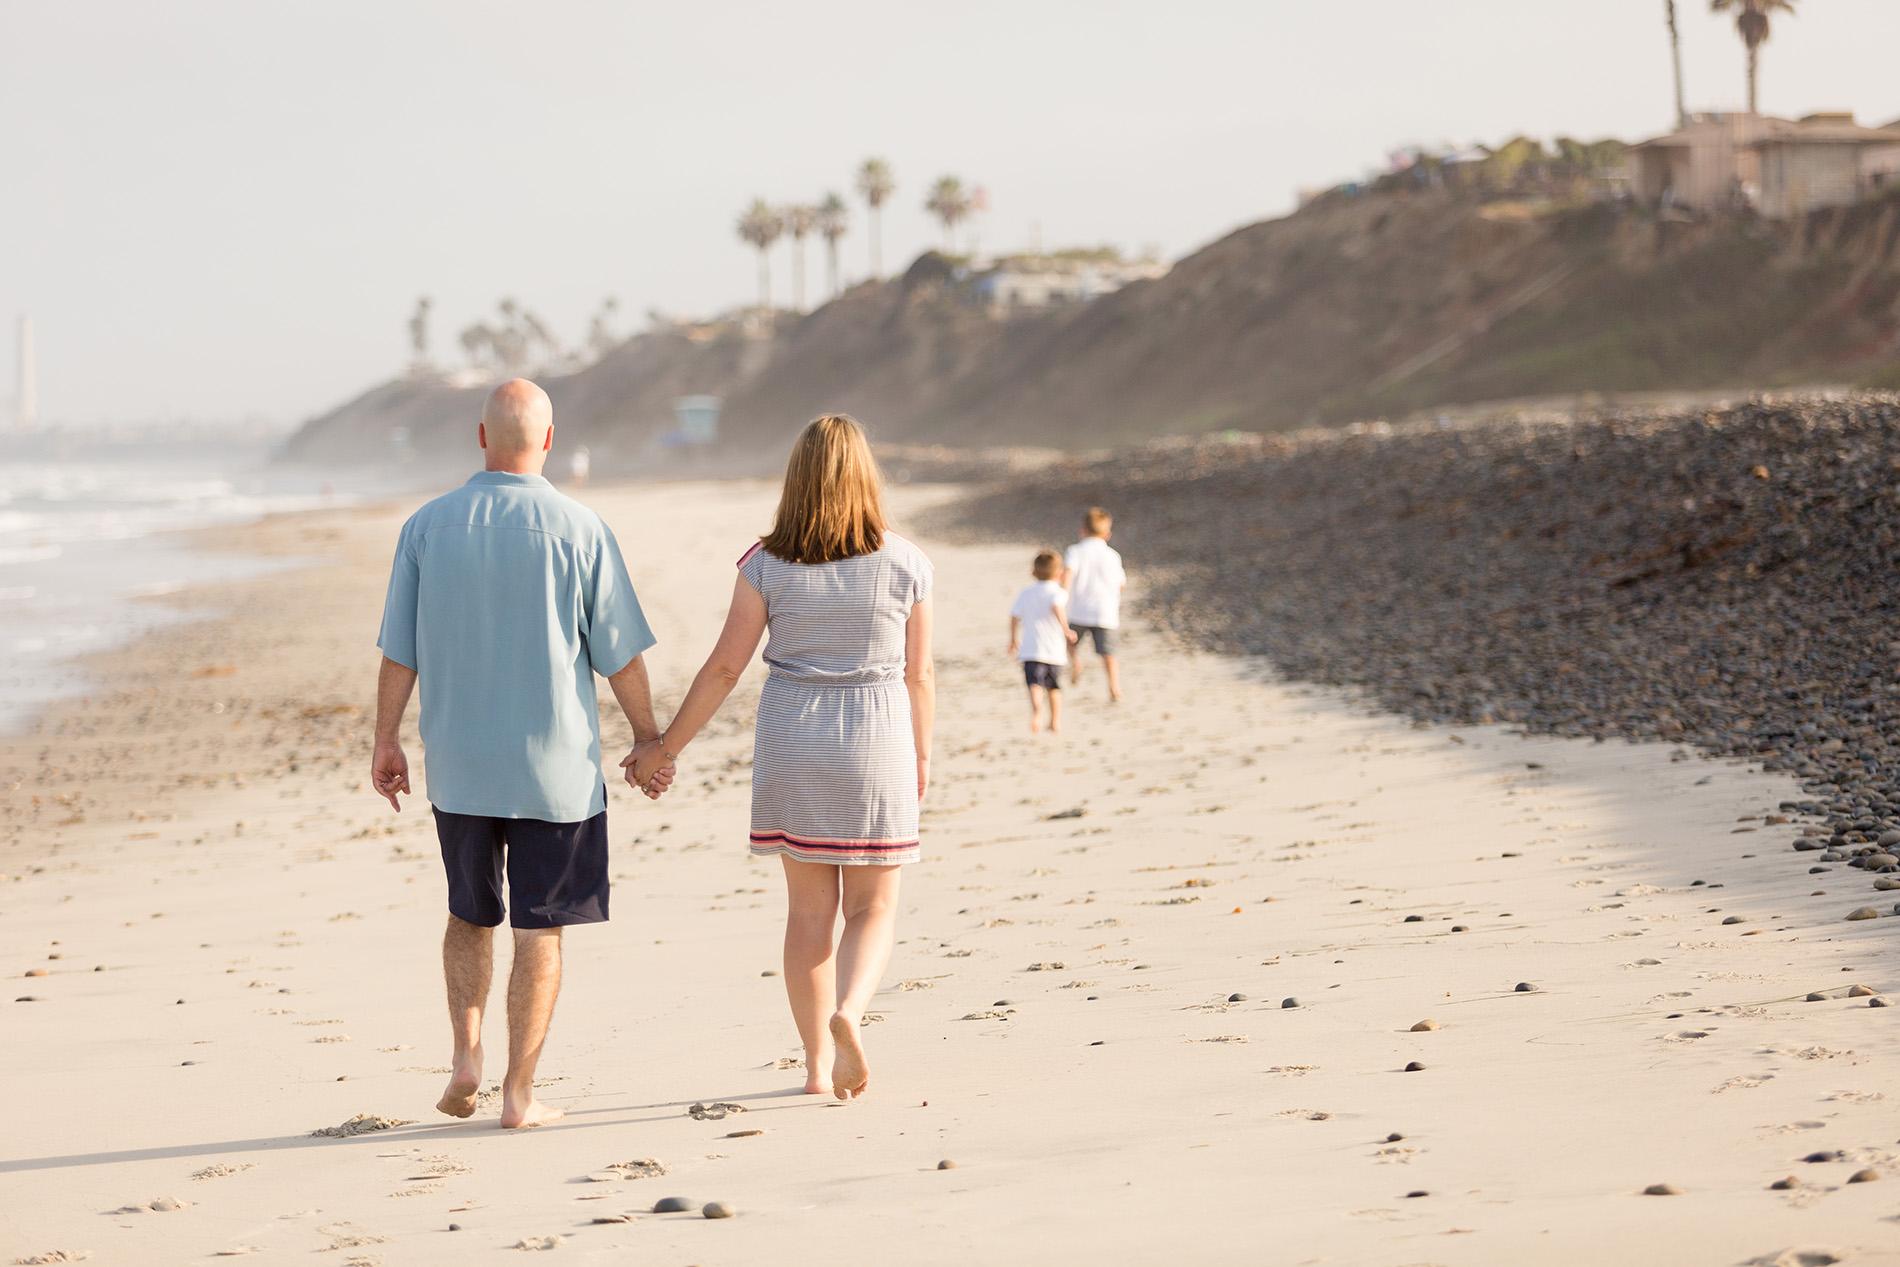 San-Diego-vacation-photographer-christine-dammann-photography-ws.28.jpg